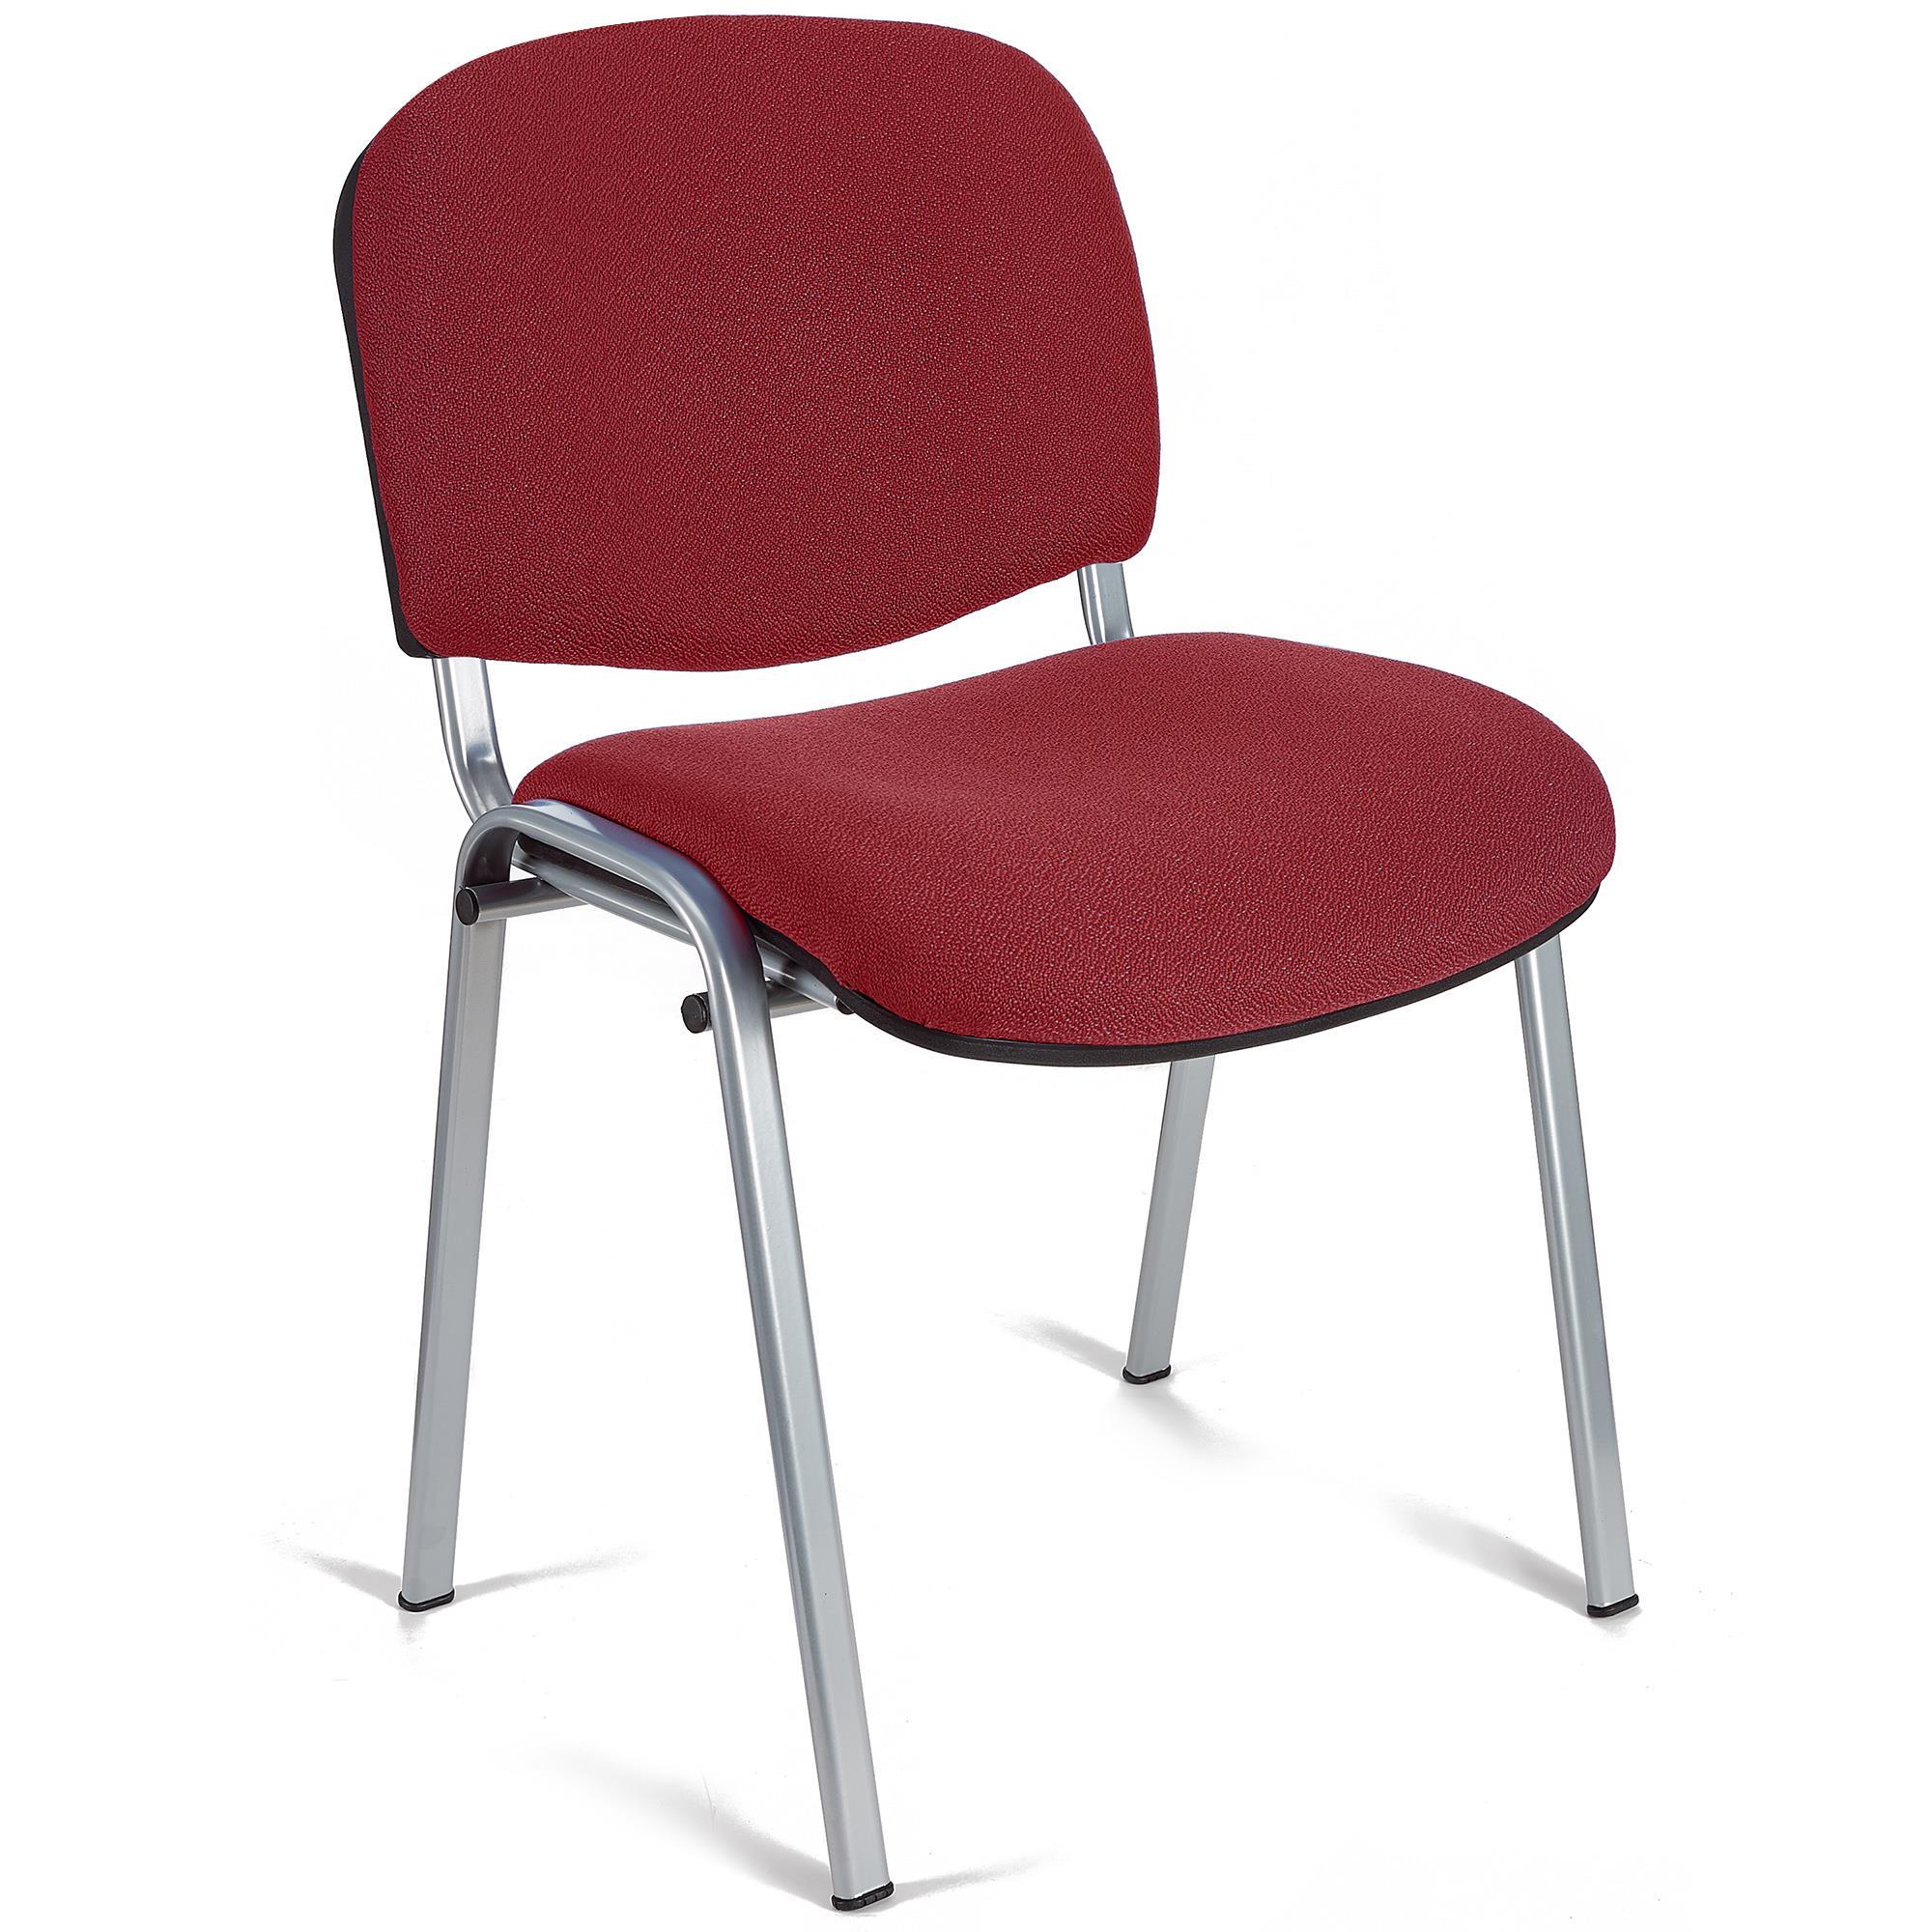 Sedia per sala conferenze moby base colore bordeaux con for Sedie design grigie